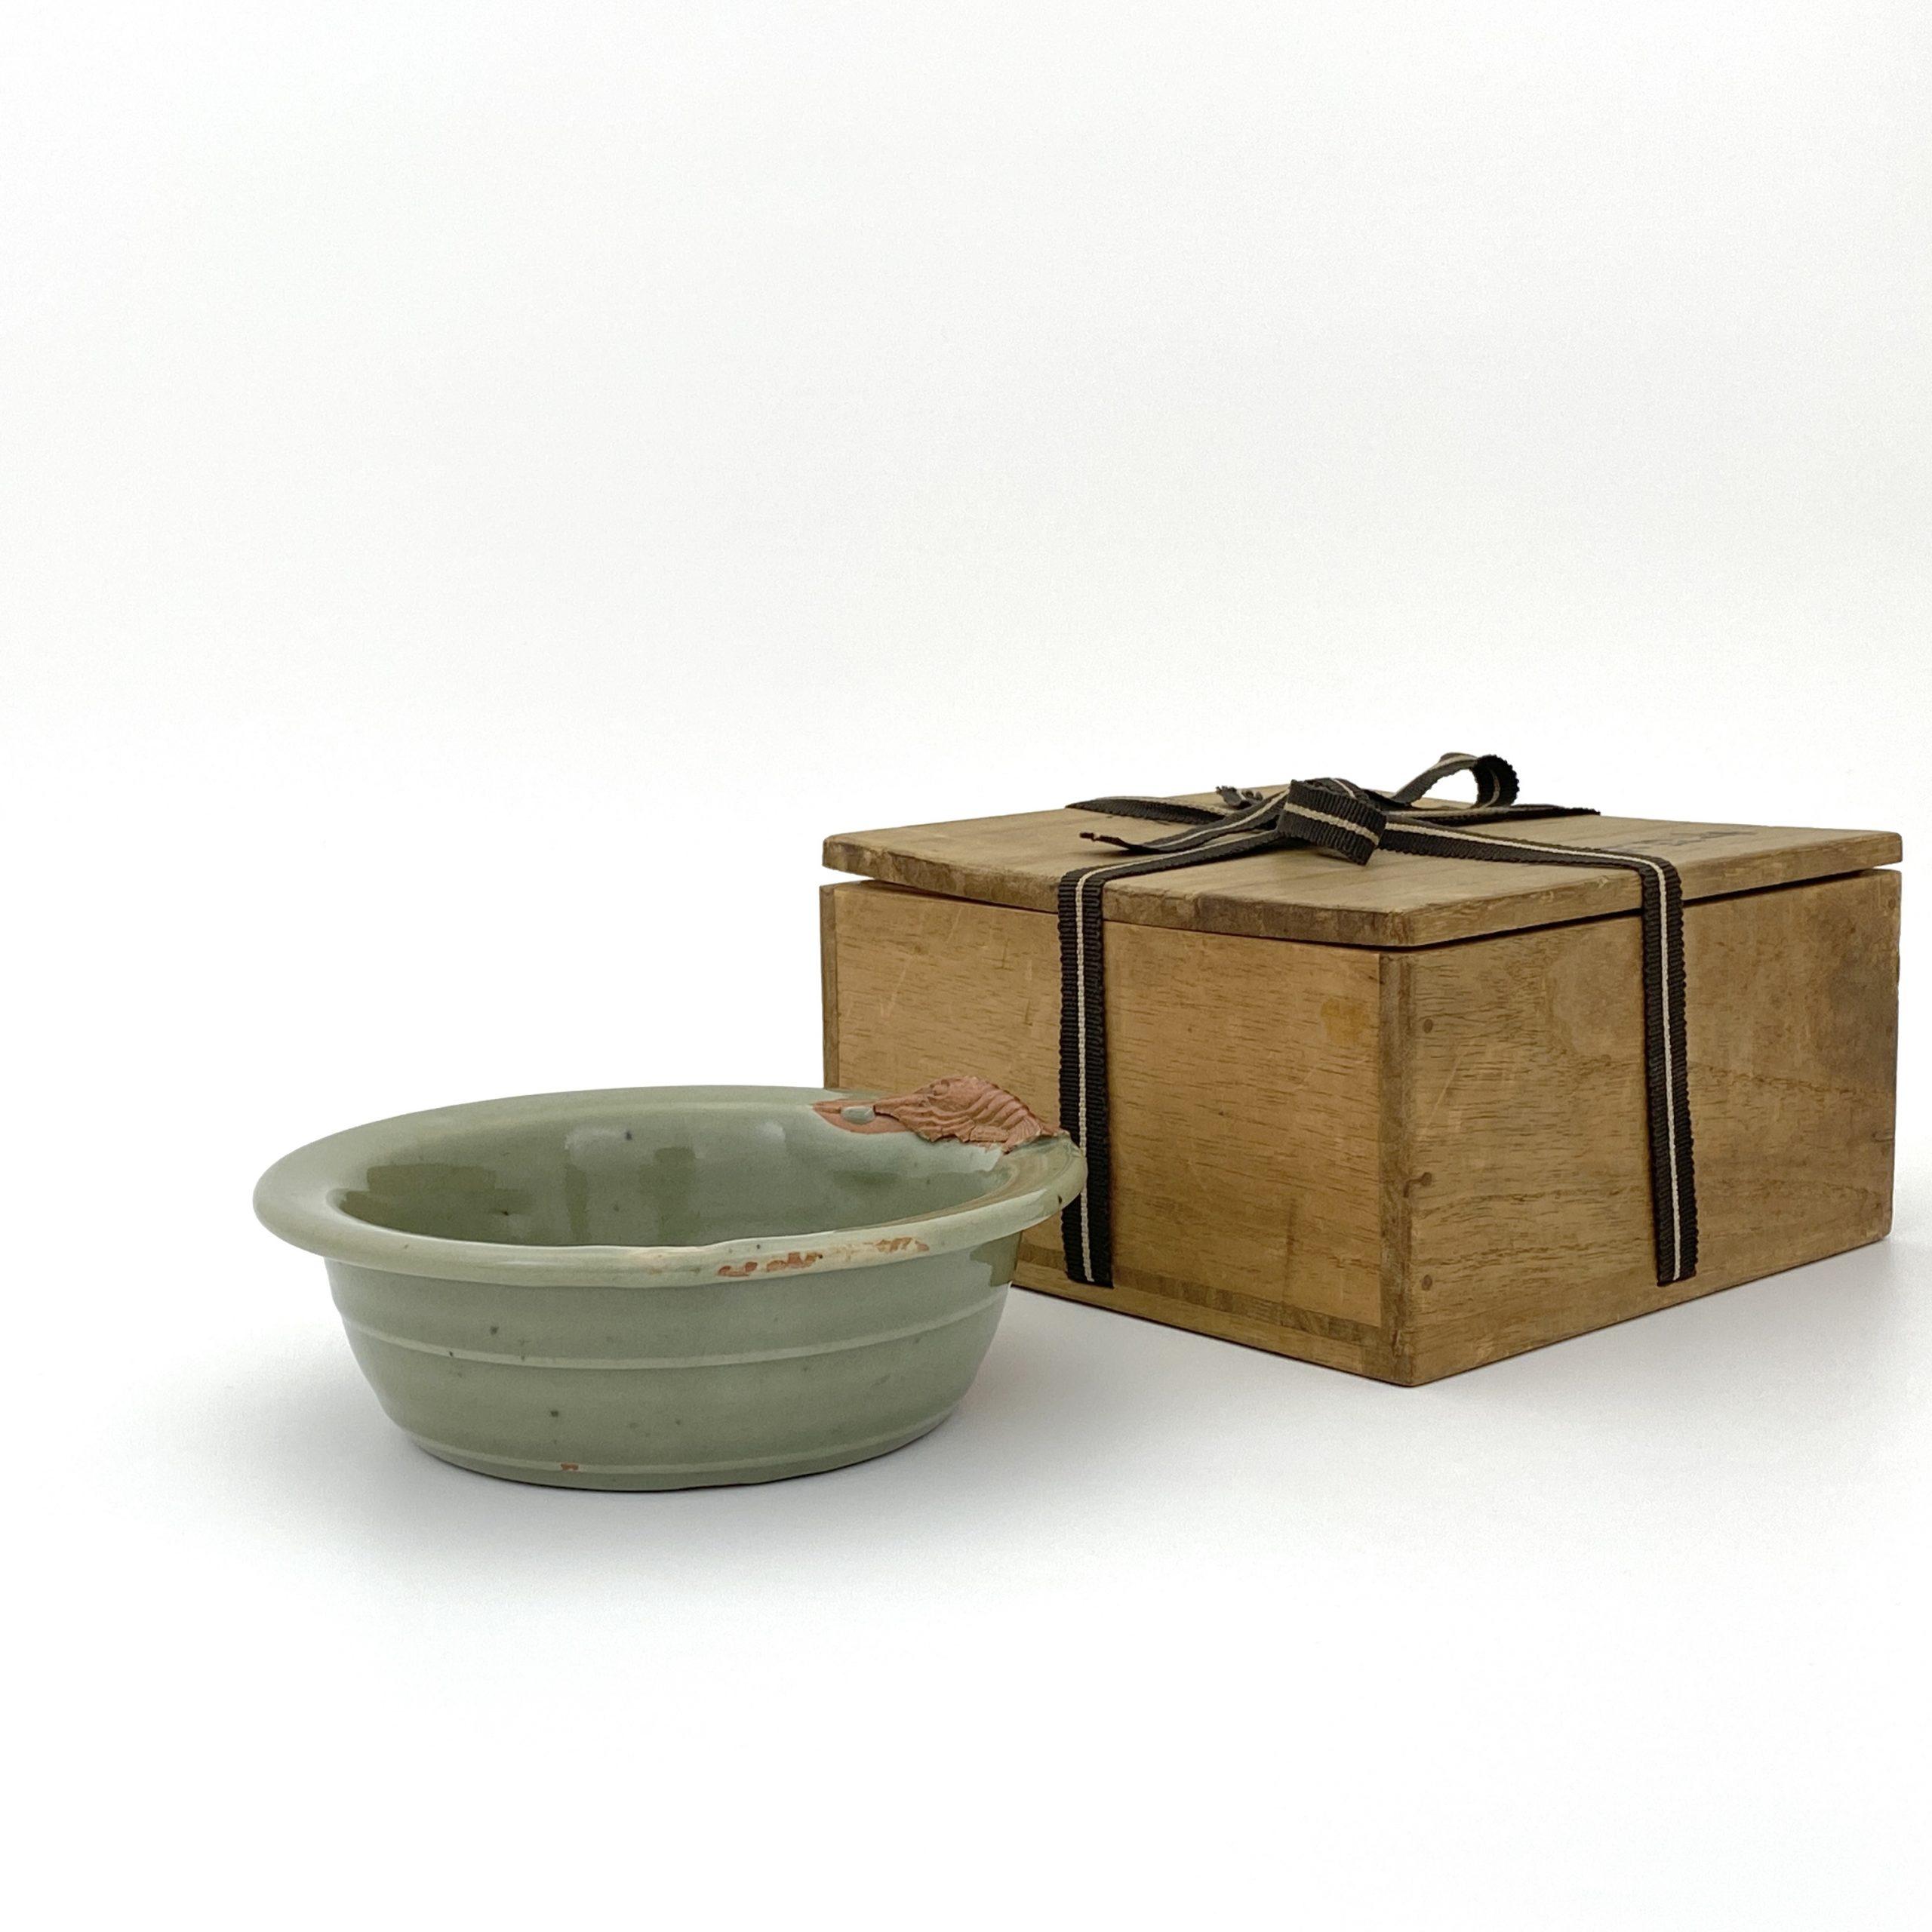 30104明 龍泉窯 蝦紋 碗